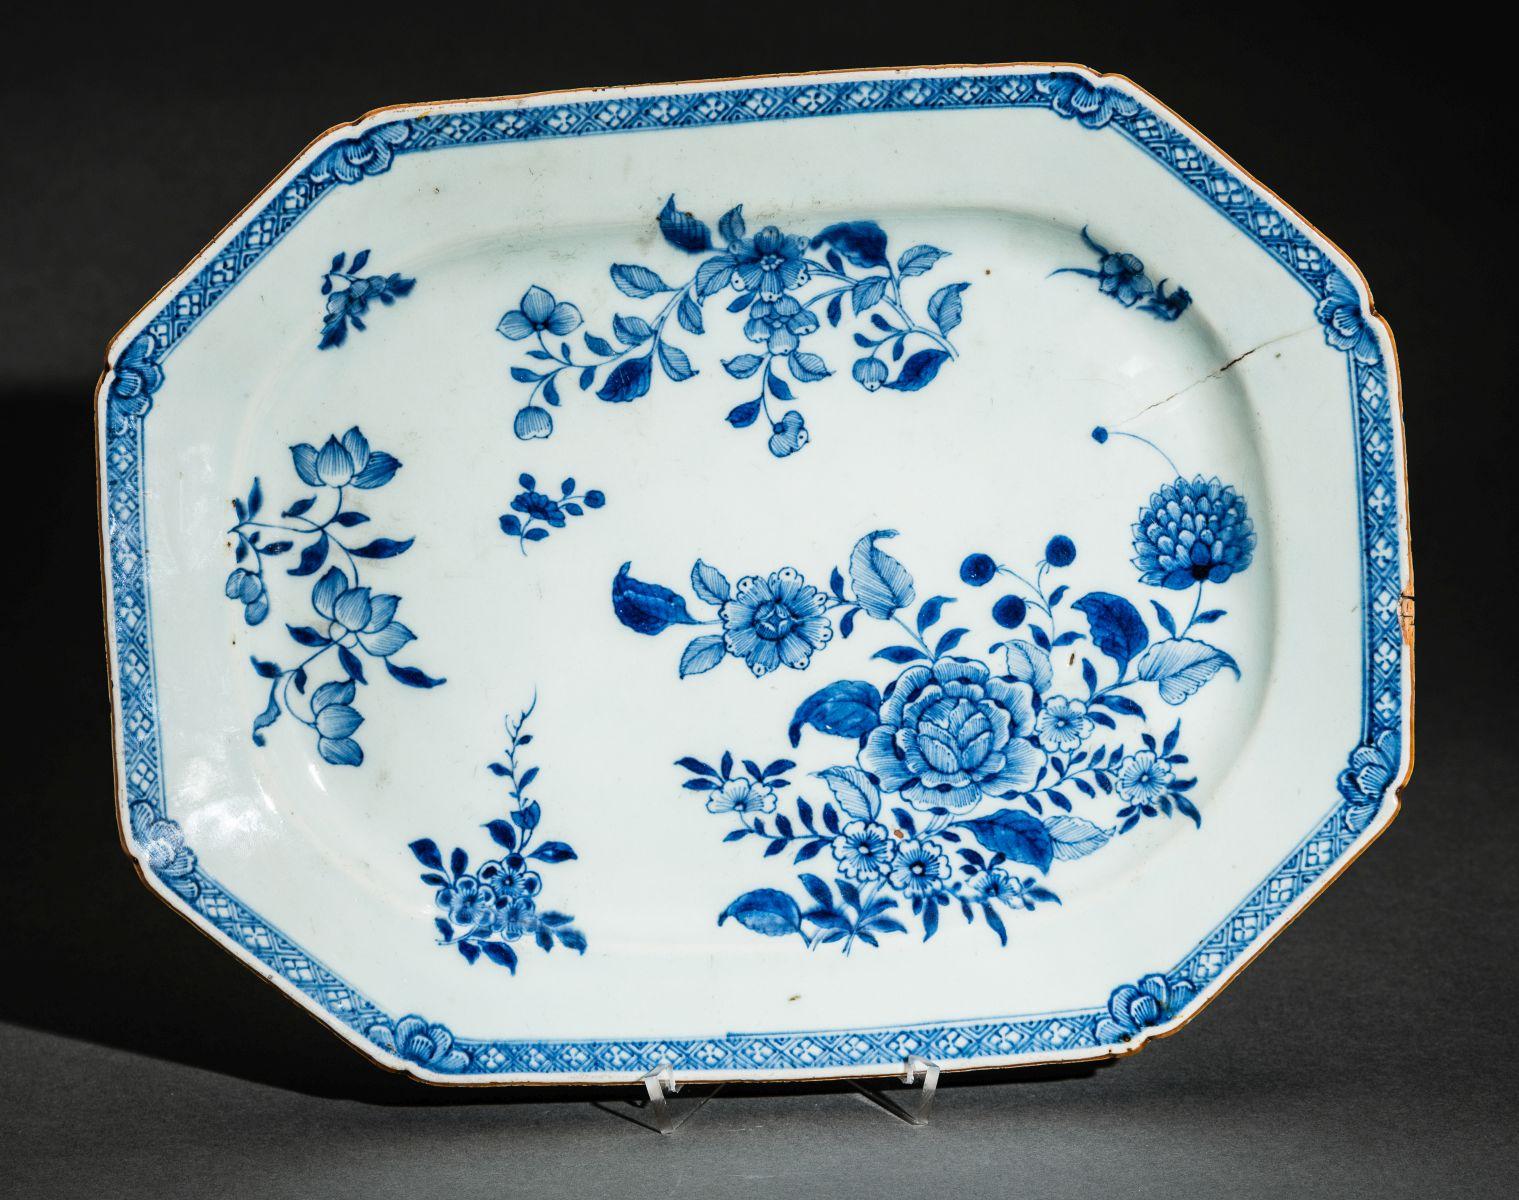 #180 Porcelain China, Qing dynasty (1644-1912), 18th century   Porzellan China, Qing-Dynastie (1644-1912), 18. Jahrhundert Image